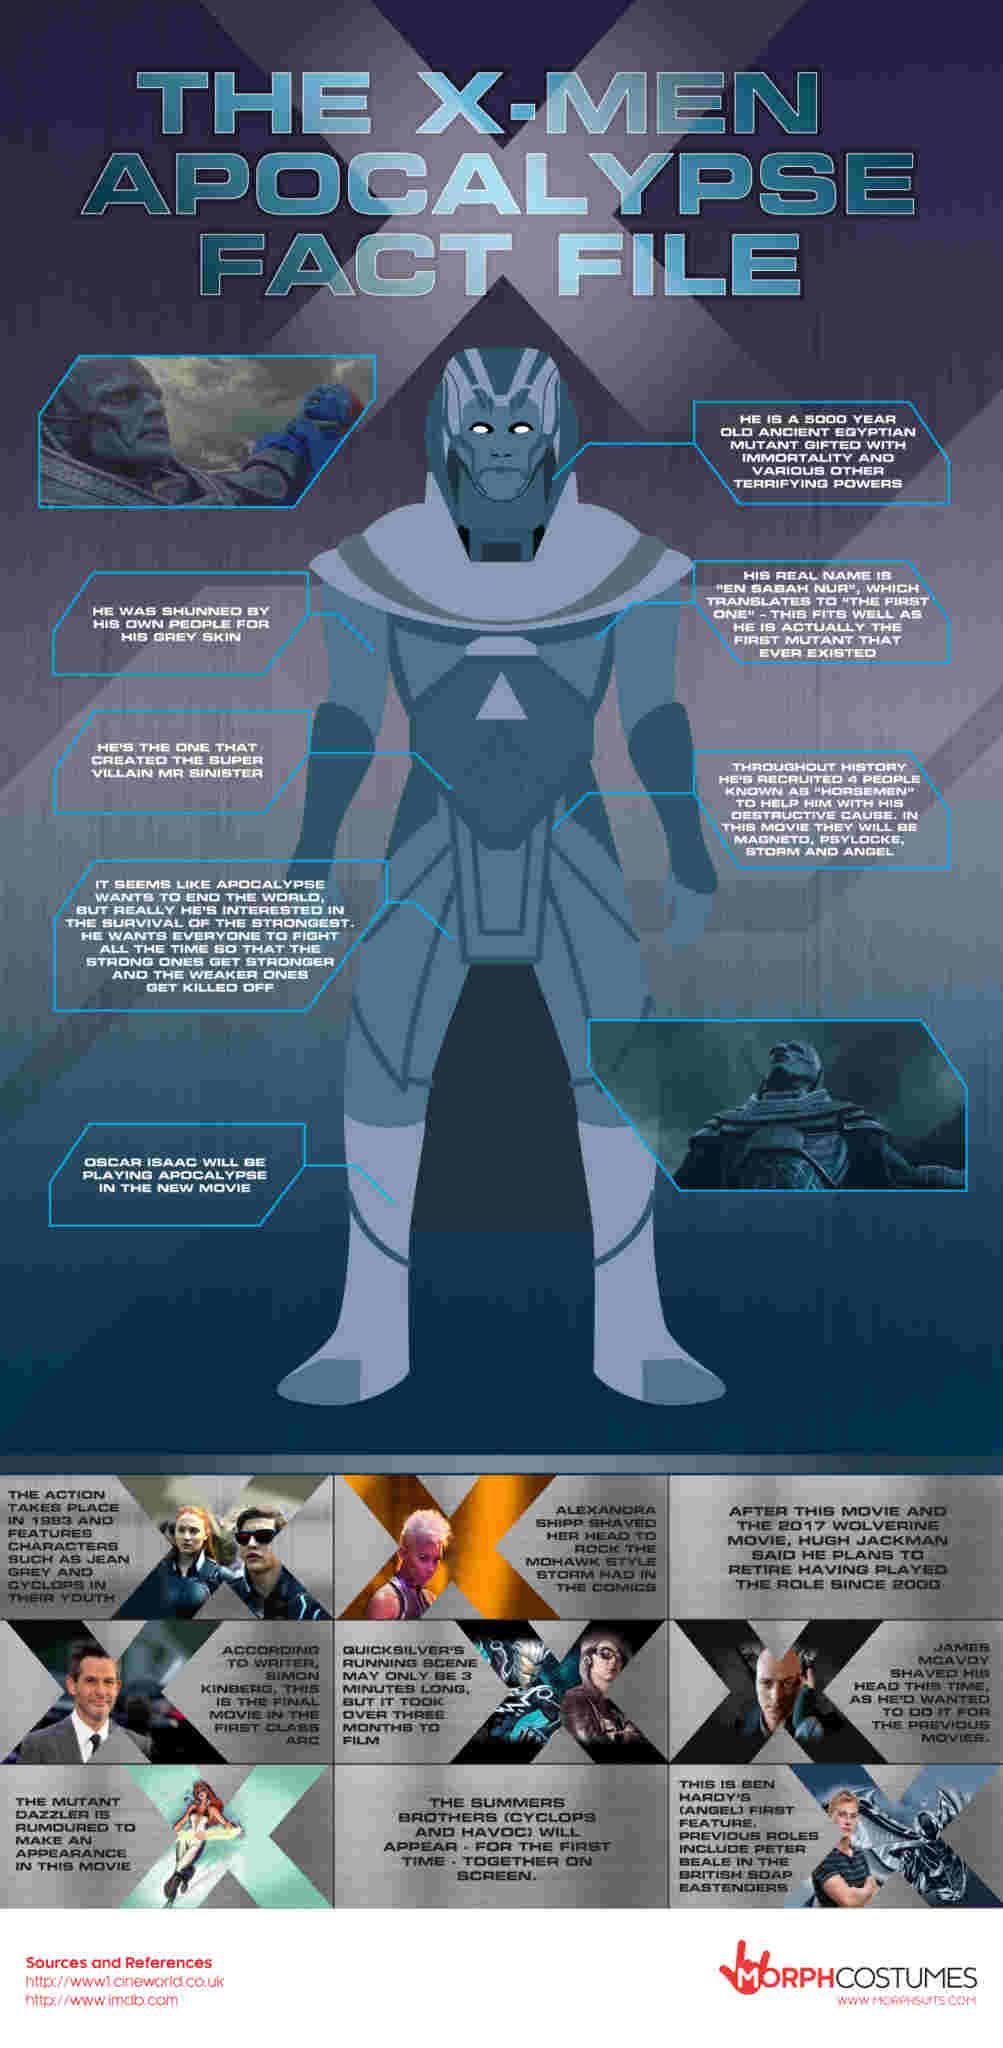 The-X-Men-Apocalypse-Fact-File-Infographic